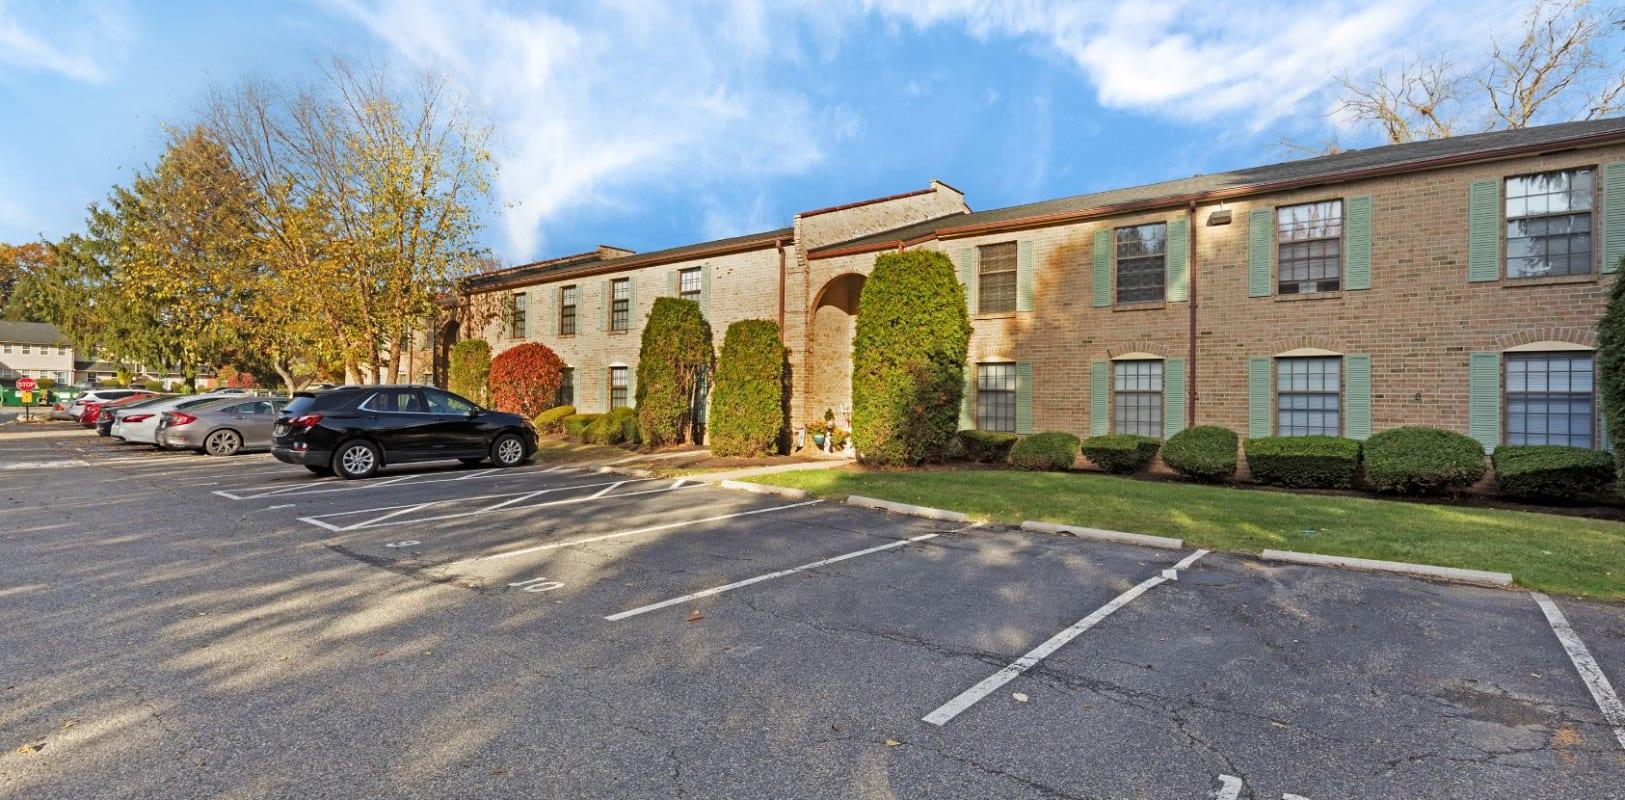 Parking lot at Bridle Path Apartments in Bethlehem, Pennsylvania